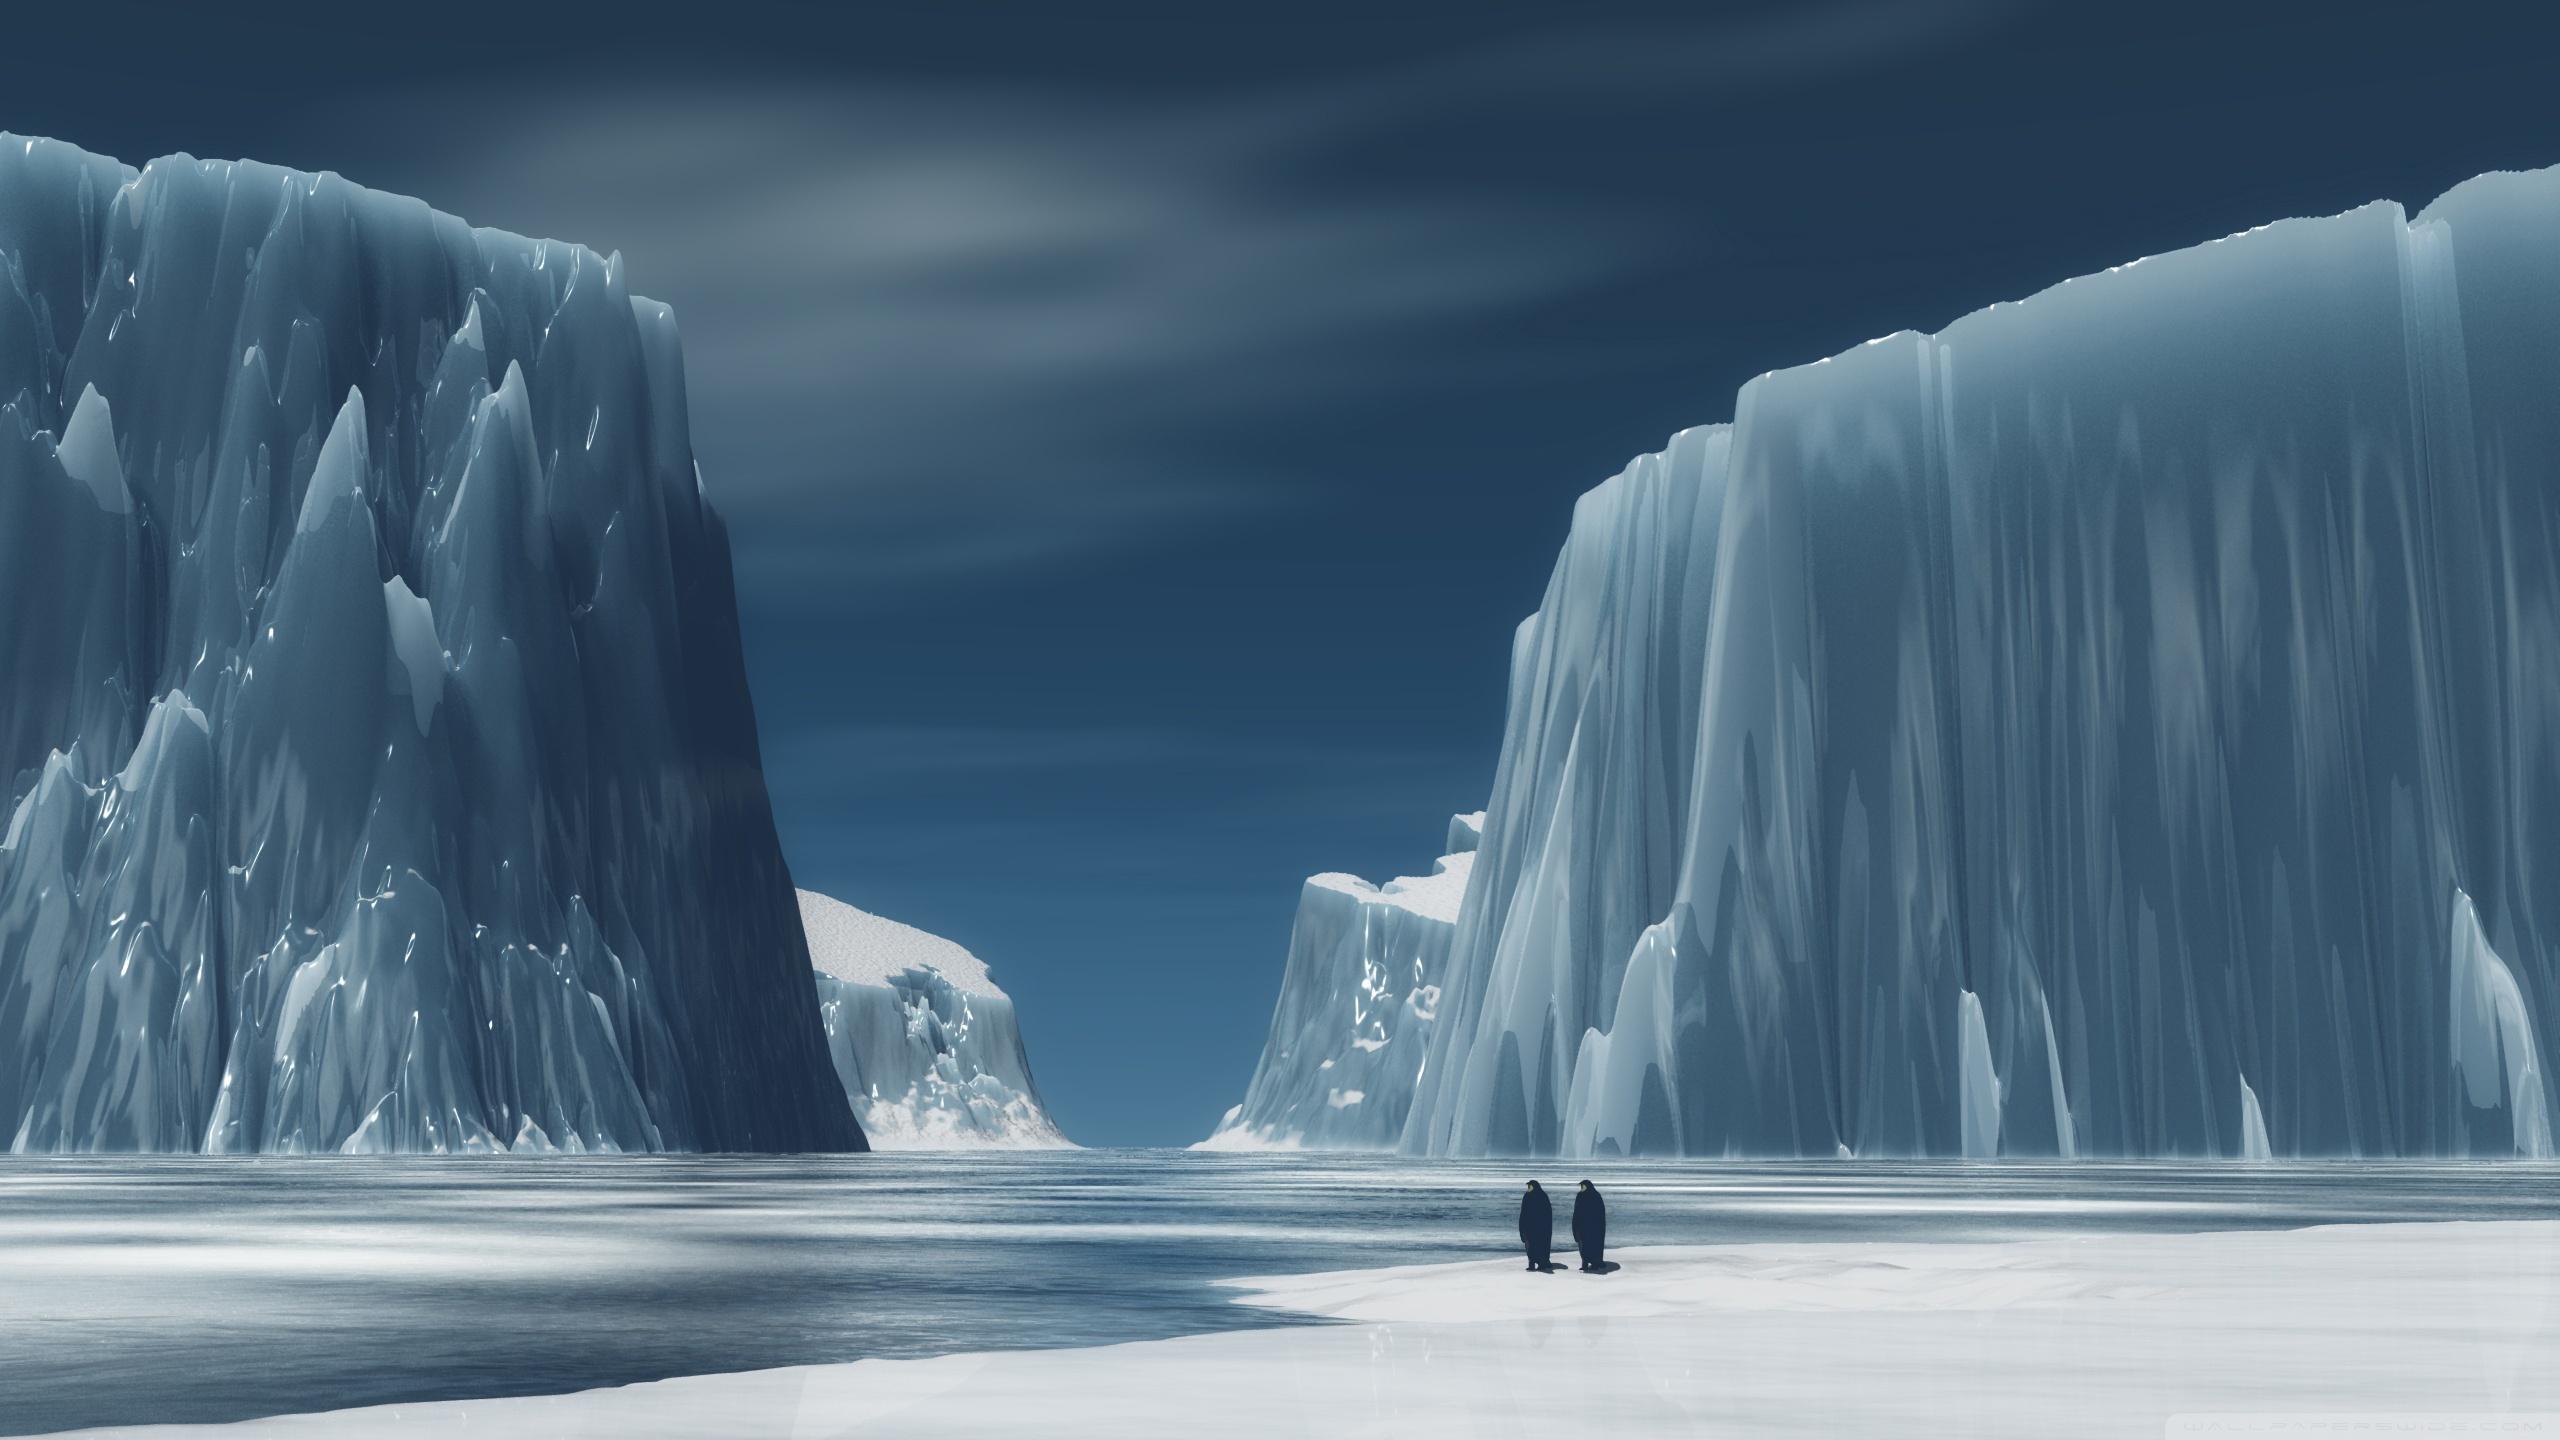 HD Antarctica Background 2560x1440